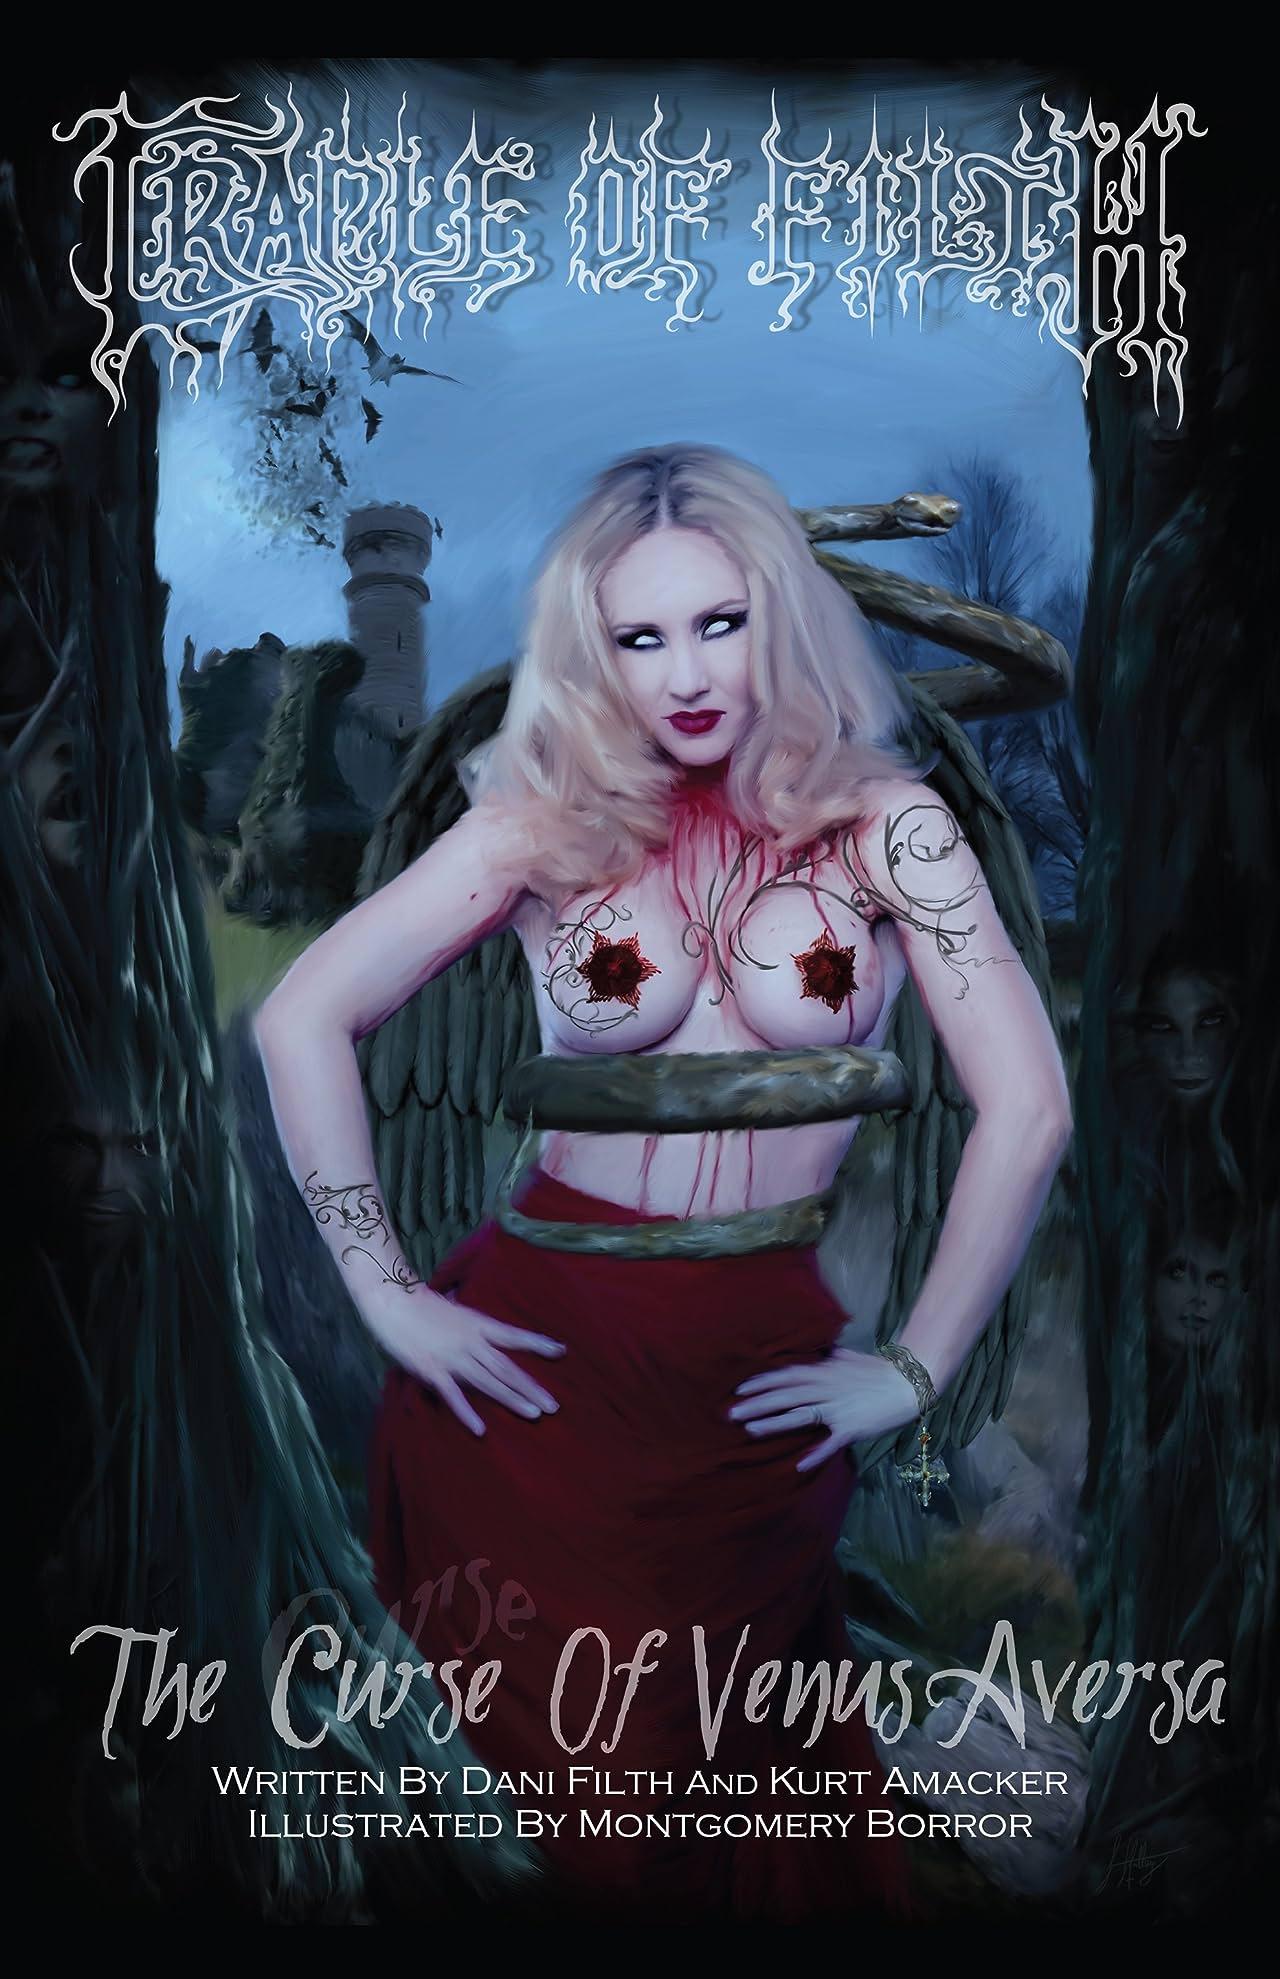 Cradle of Filth: The Curse of Venus Aversa Vol. 1